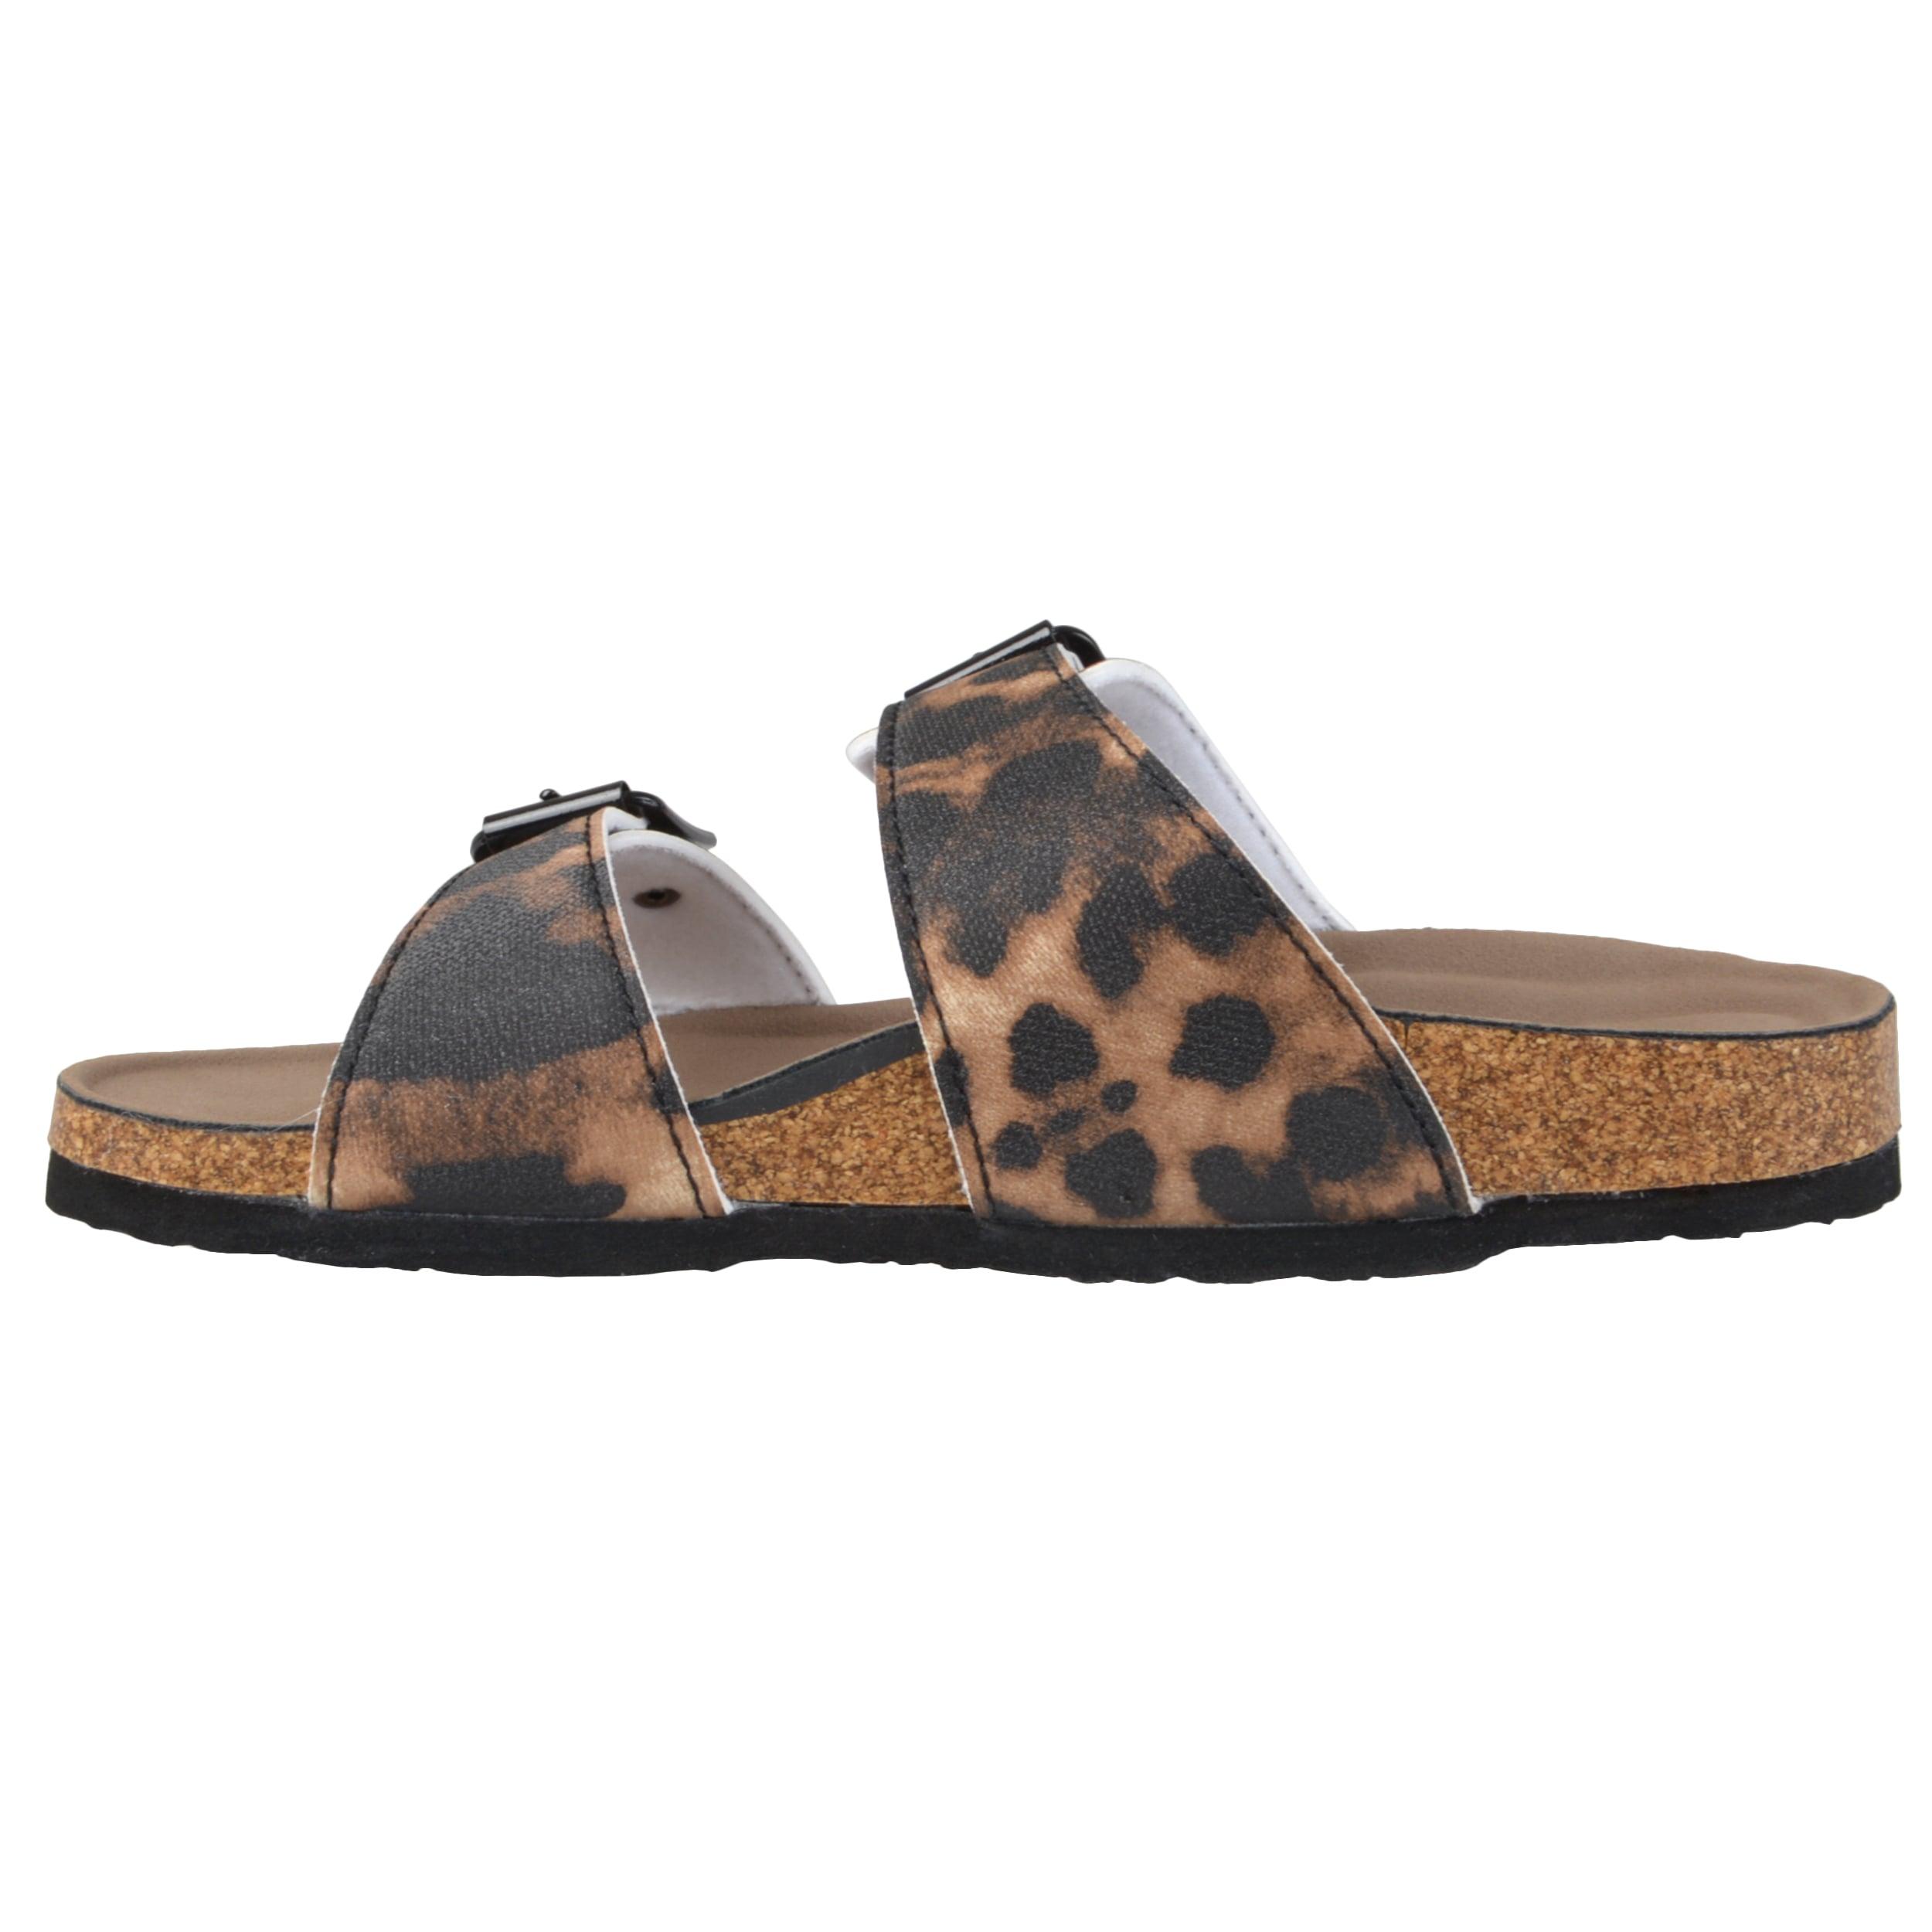 ab500cfaada Shop Madden Girl by Steve Madden Women s  Brando  Buckle Slide Sandals -  Free Shipping On Orders Over  45 - Overstock - 9207986